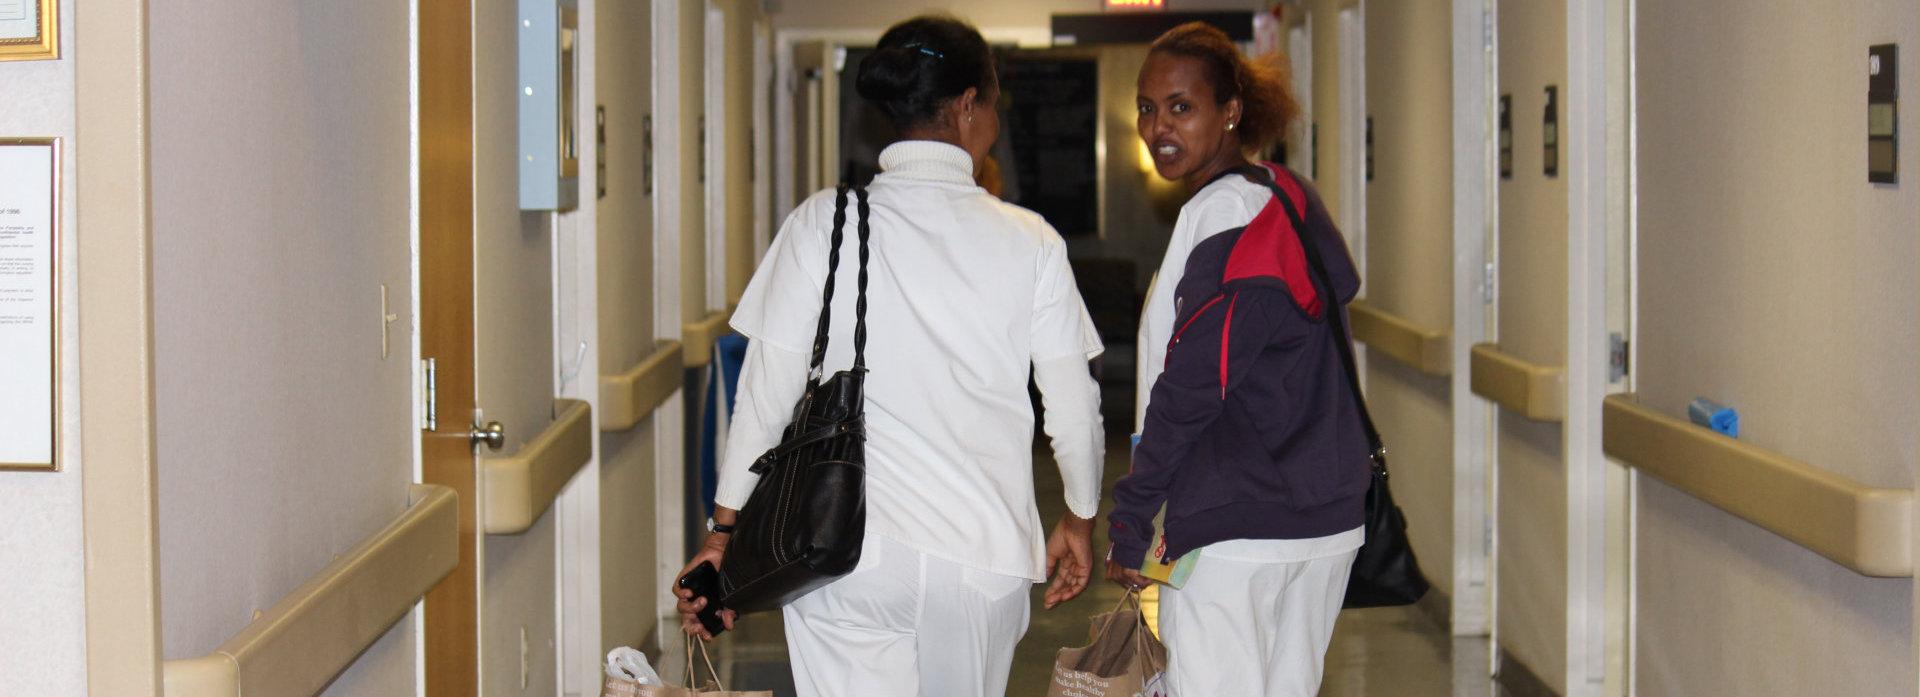 two nurse walking down the hallway